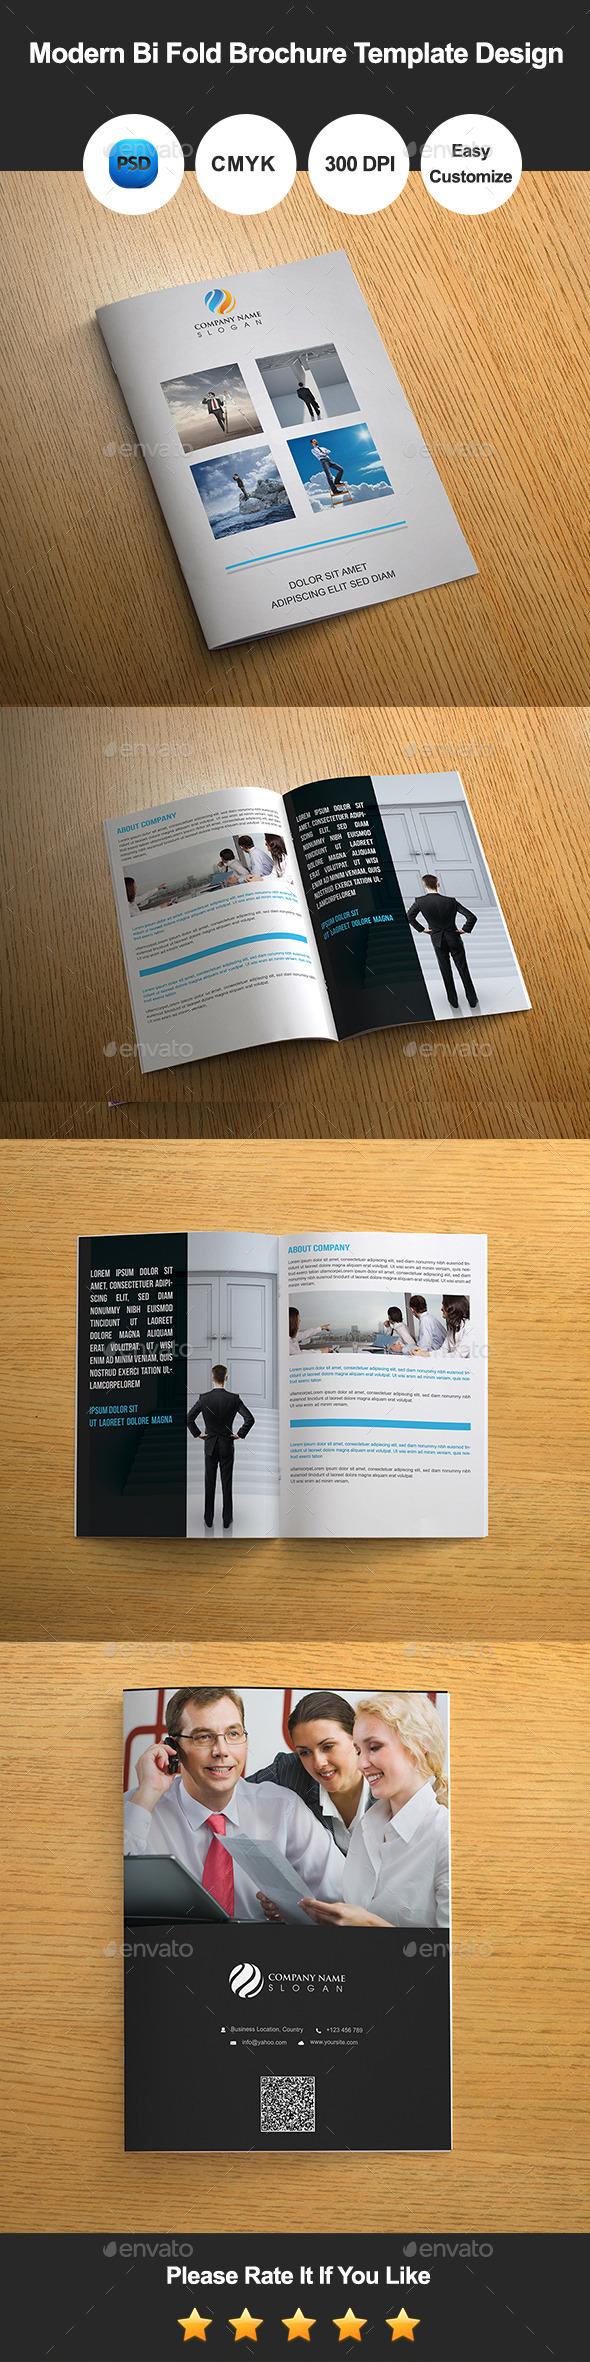 Modern Bi Fold Brochure Template Design - Corporate Brochures